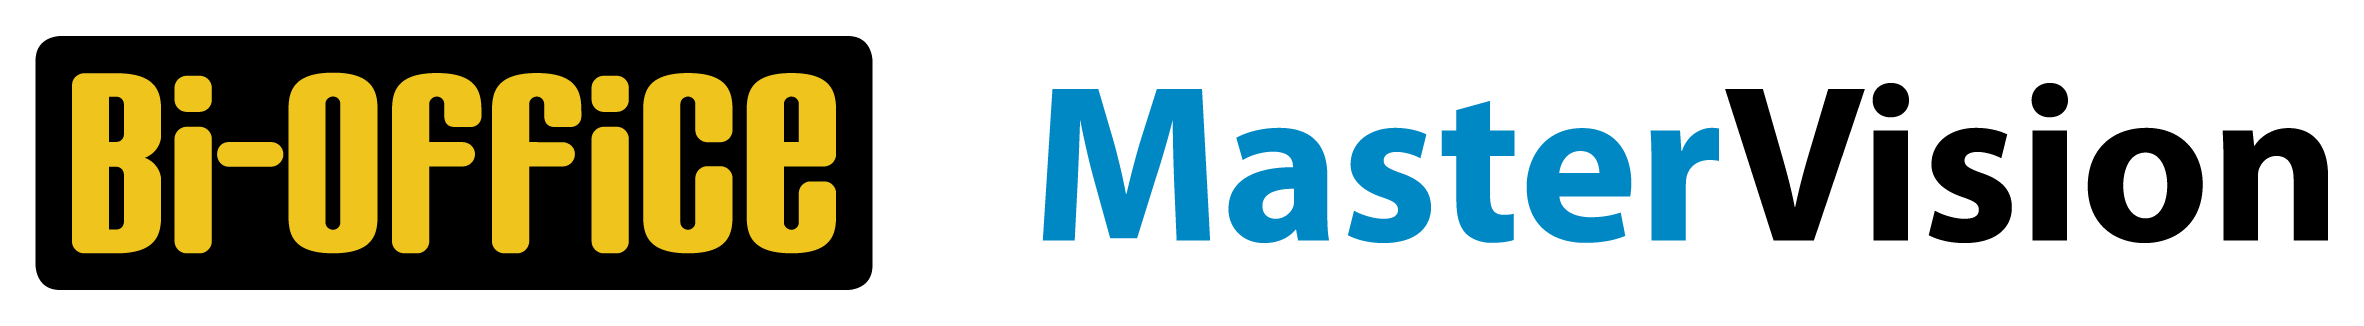 Bi-Office Mastervision